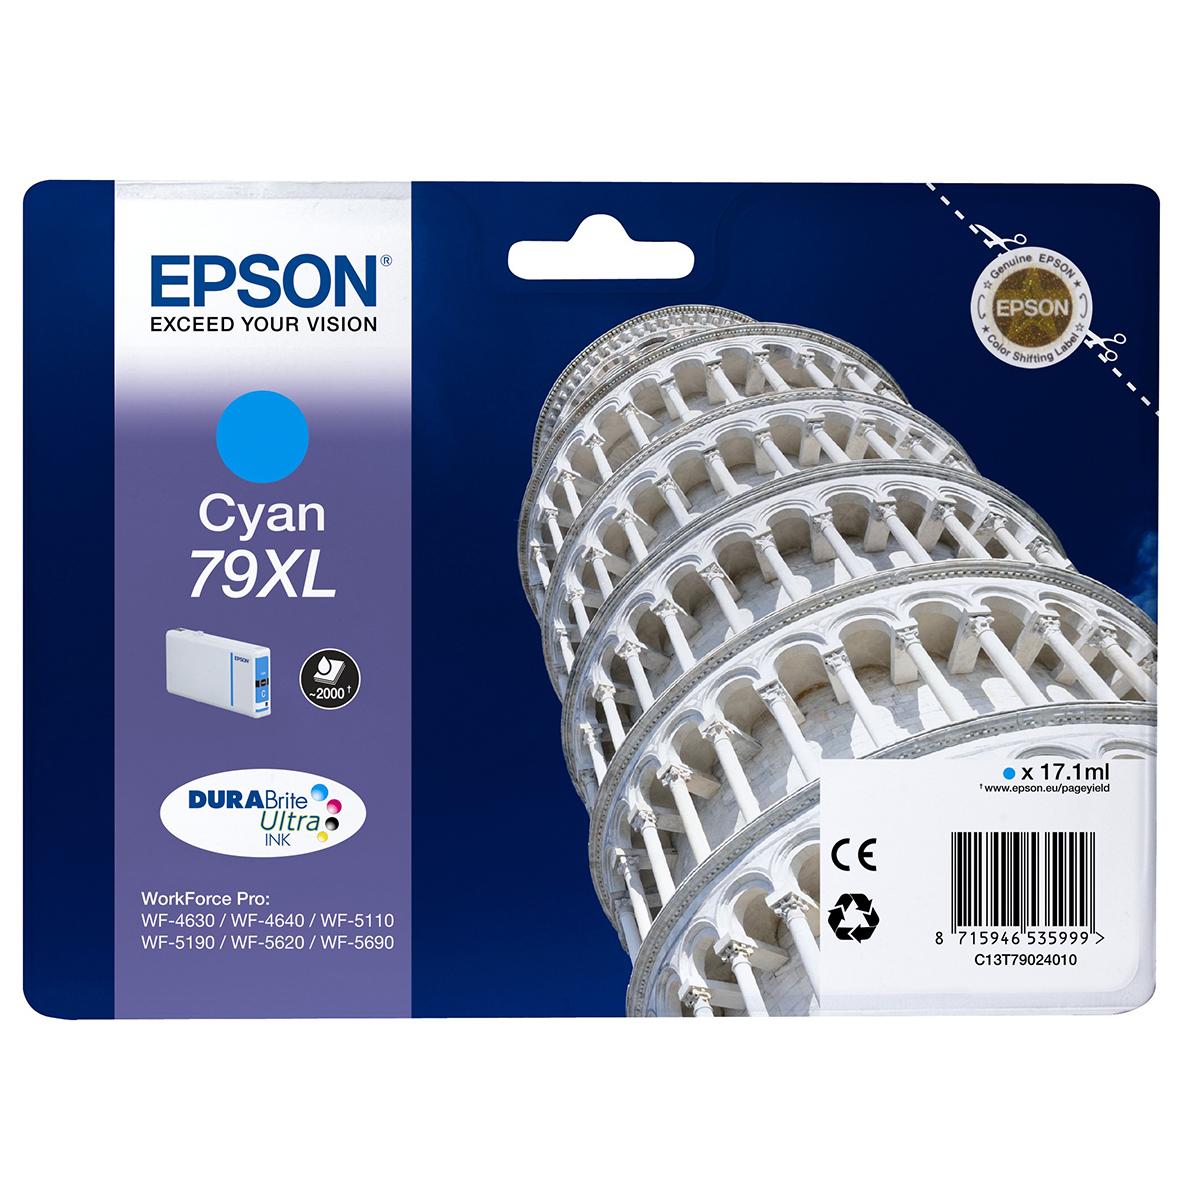 Epson 79XL Ink Cartridge Cyan